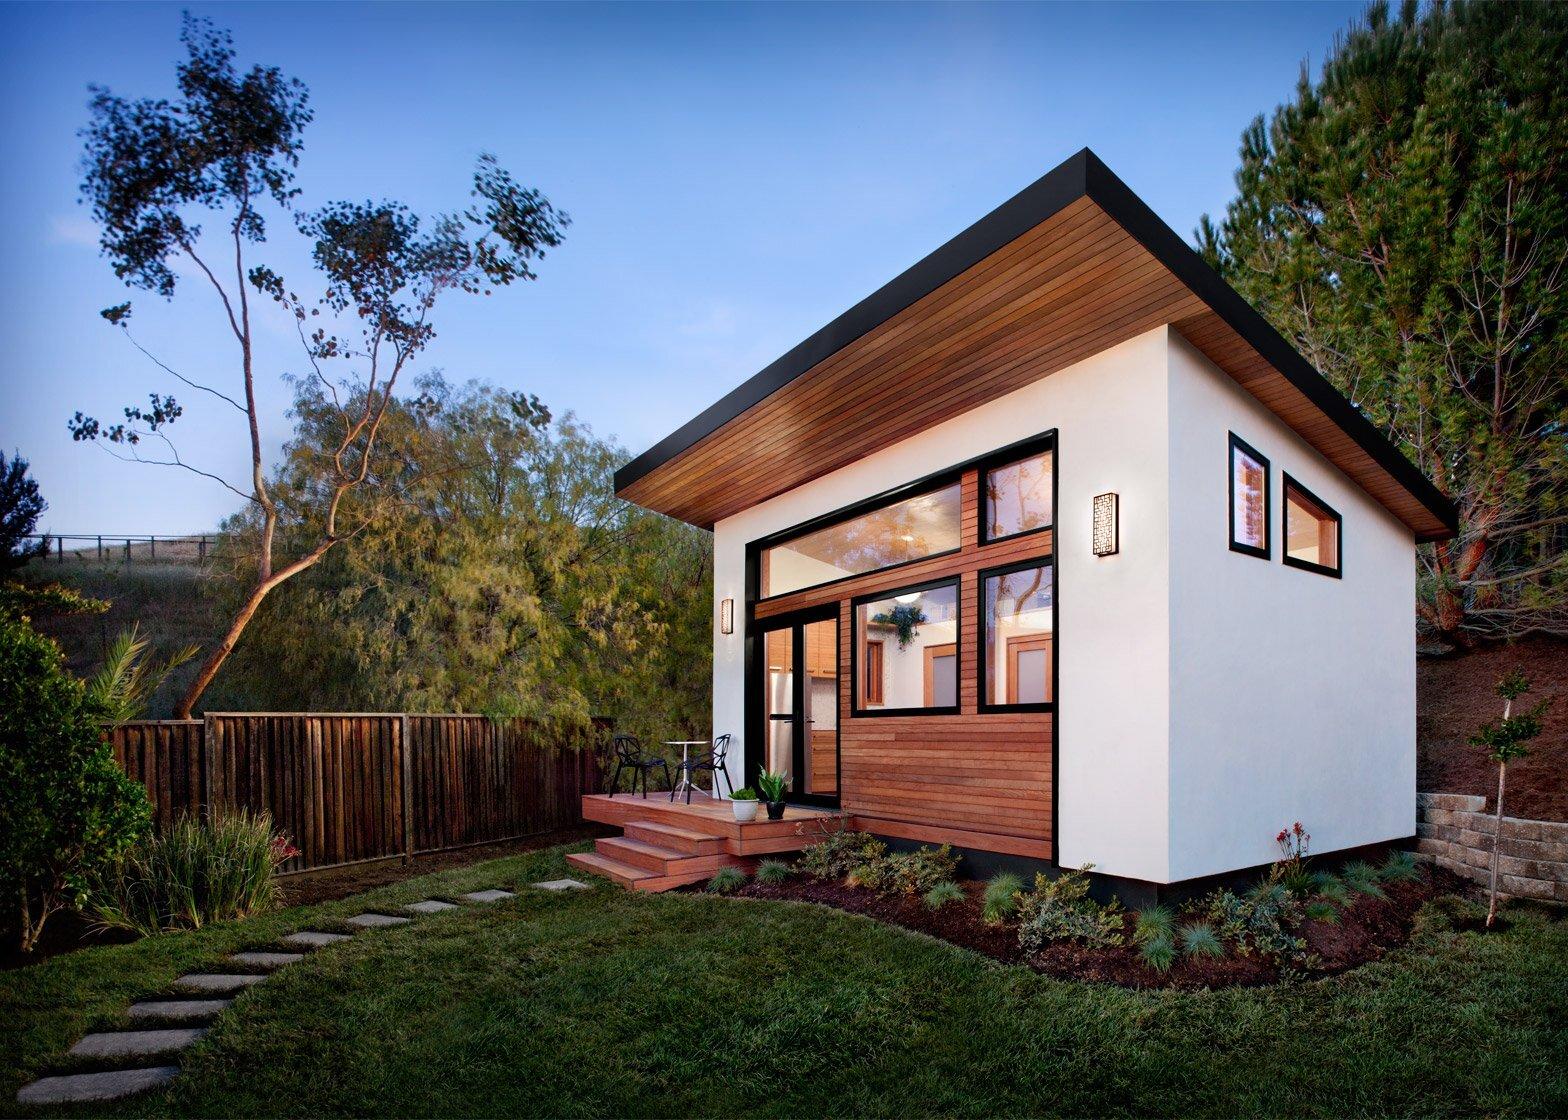 Britespace - Avava Systems - San Francisco - Exterior - Humble Homes